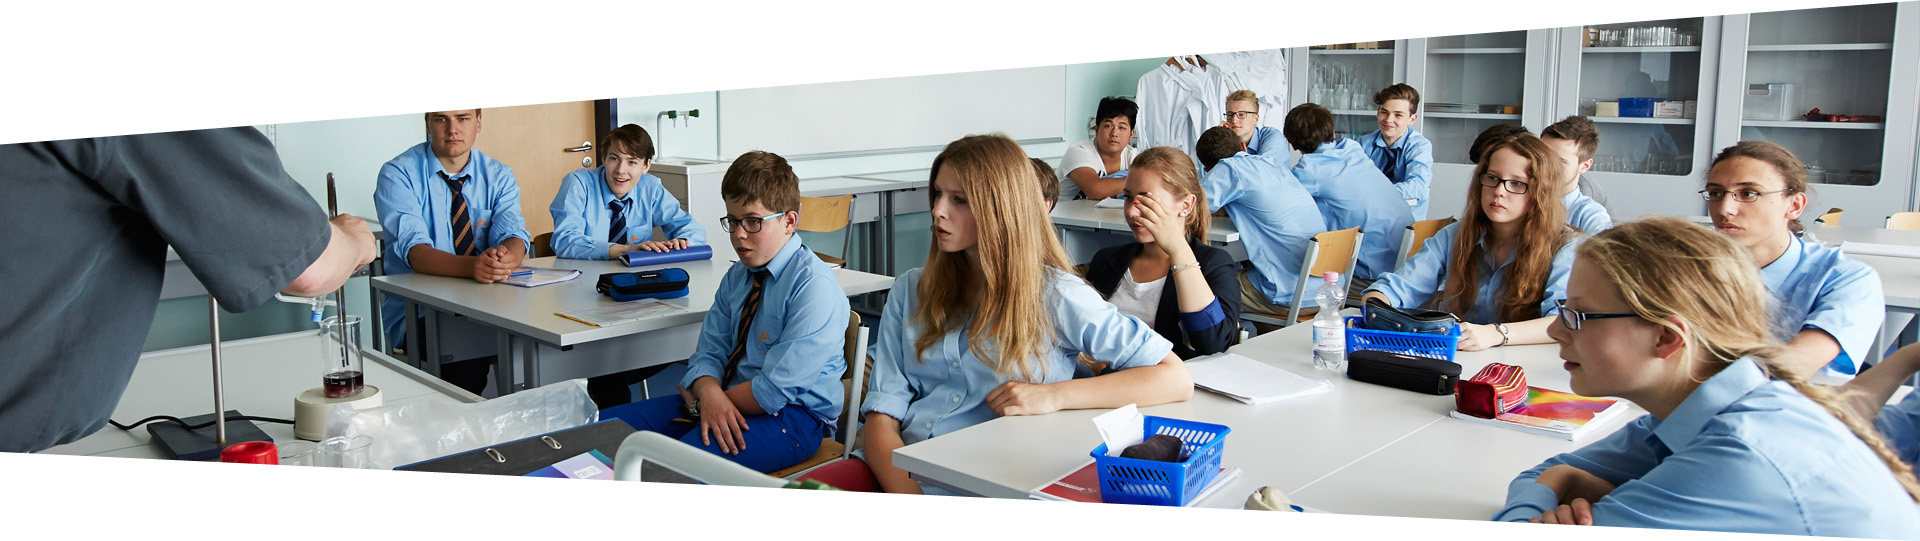 Leibniz Privatschule - Leibniz Privatschule bei Leibniz Privatschule Elmshorn Erfahrungen